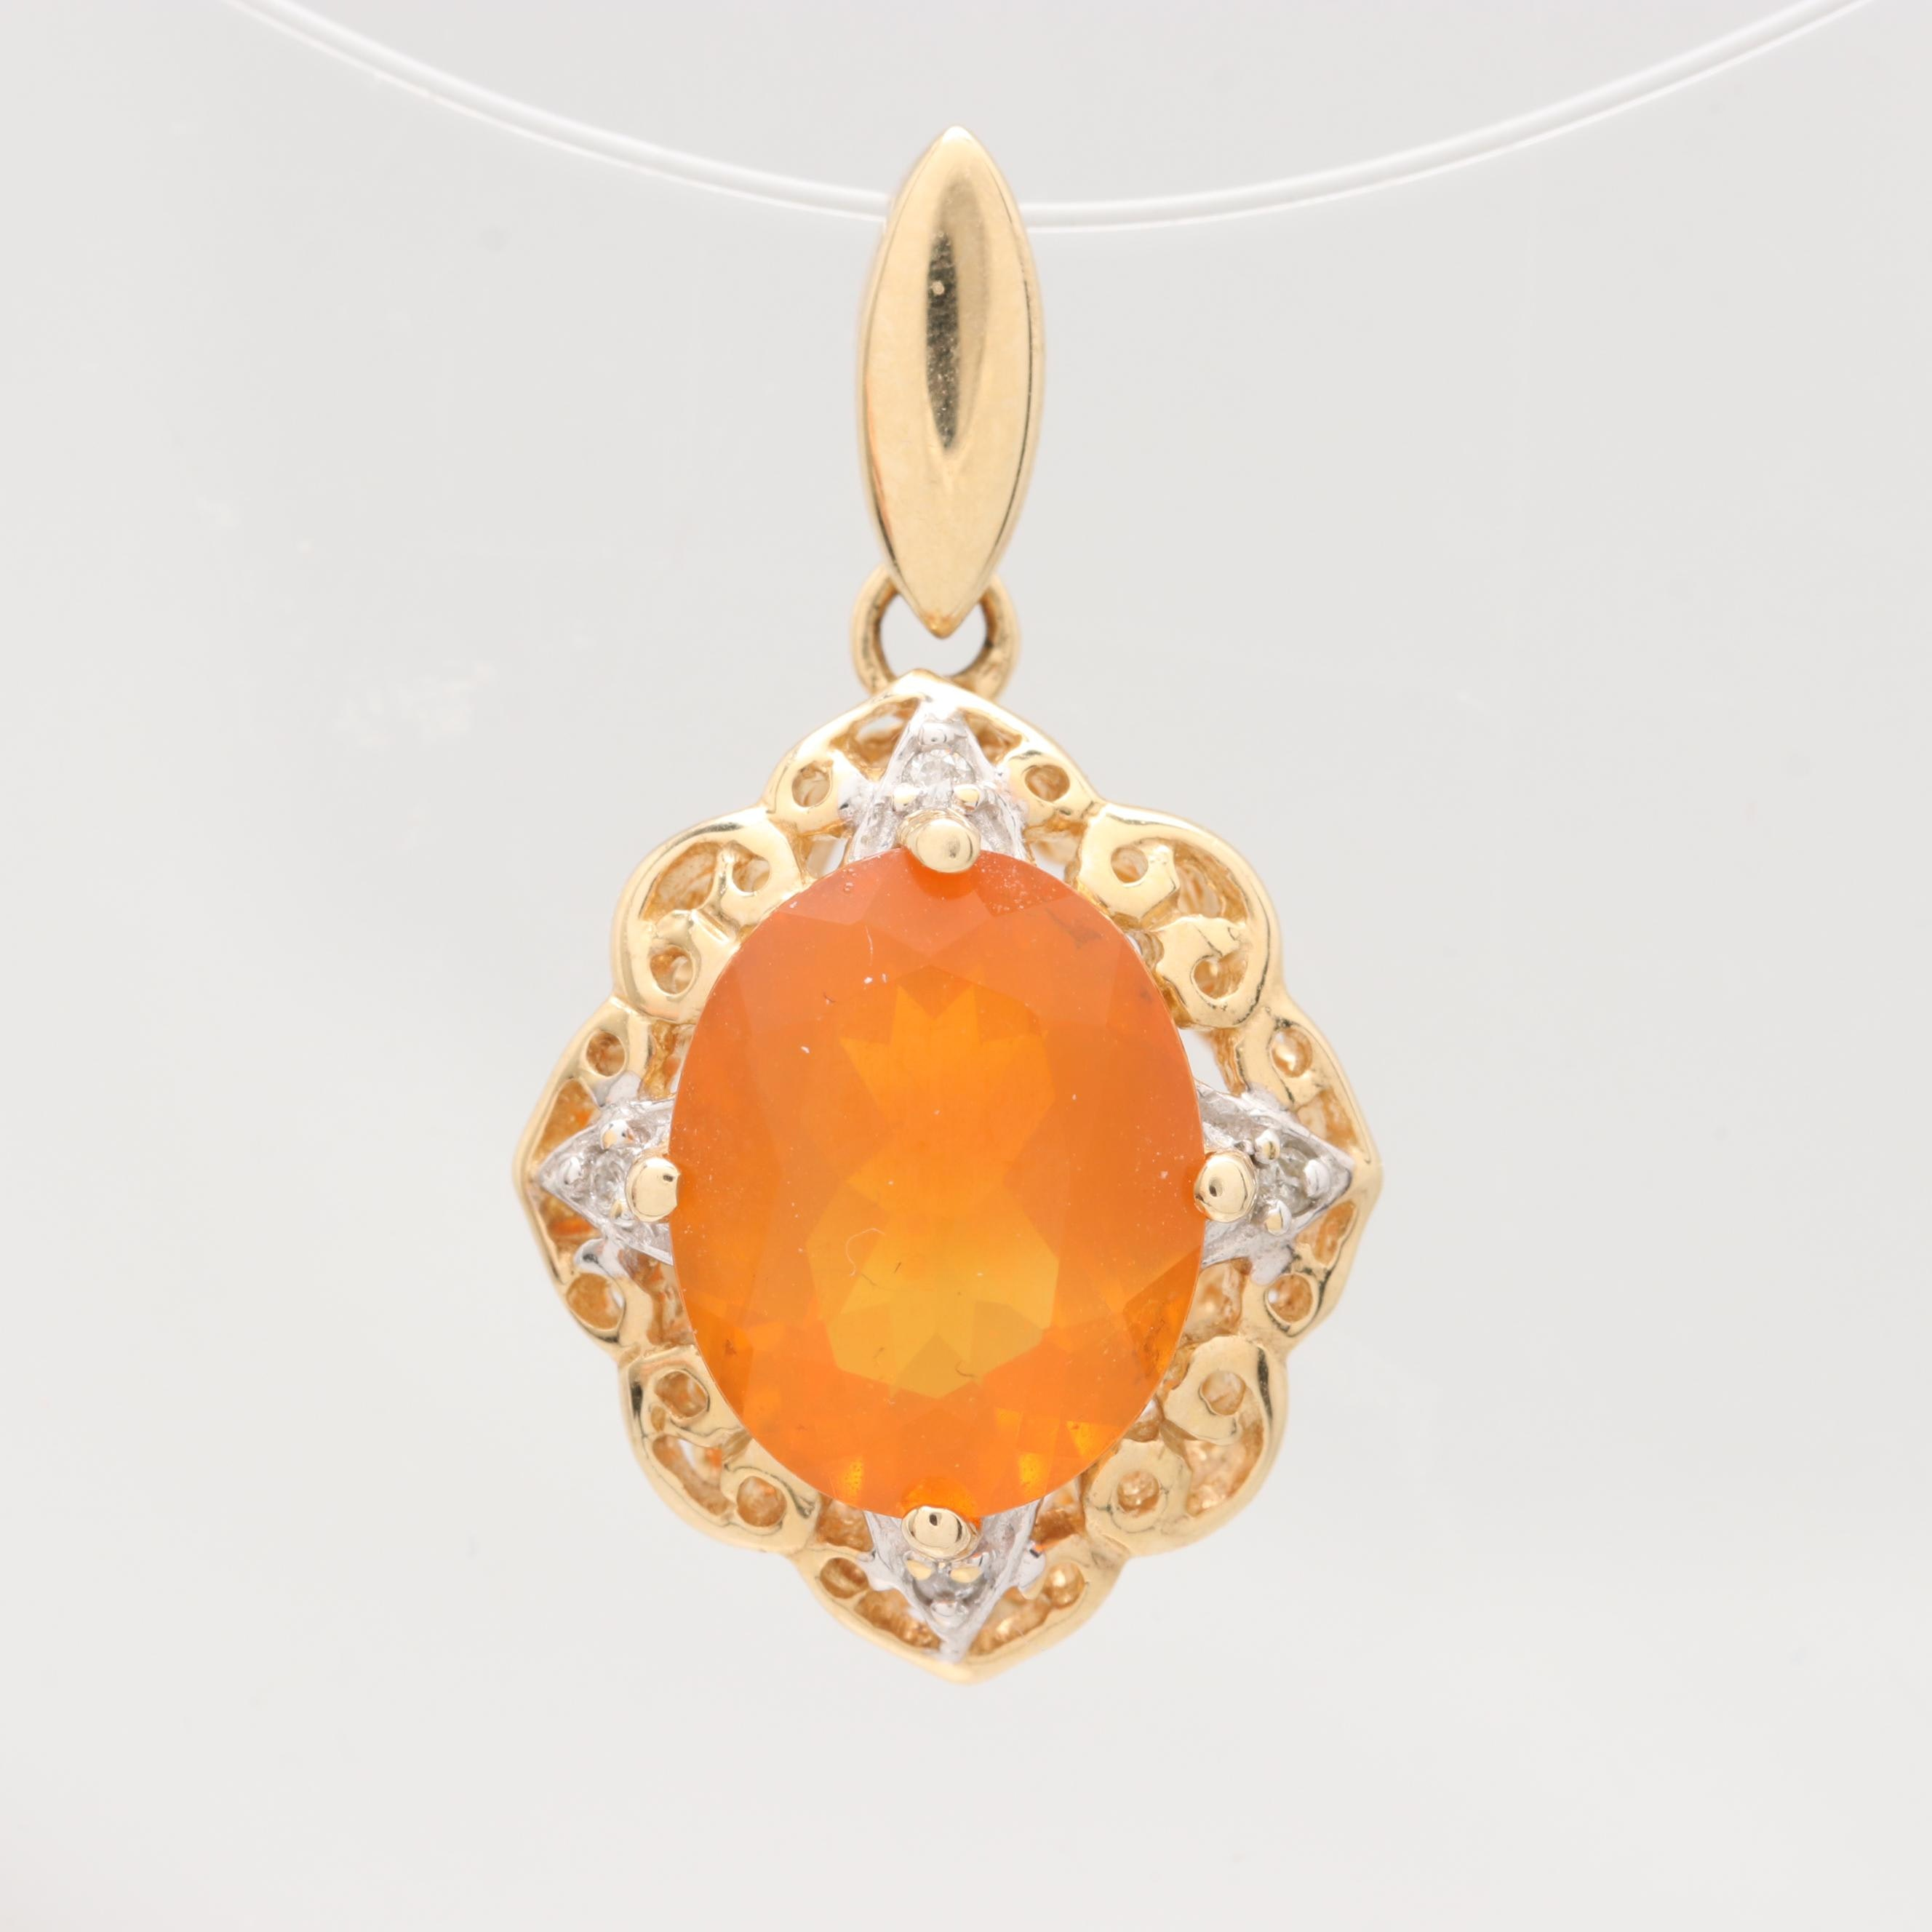 14K Yellow Gold Fire Opal and Diamond Pendant